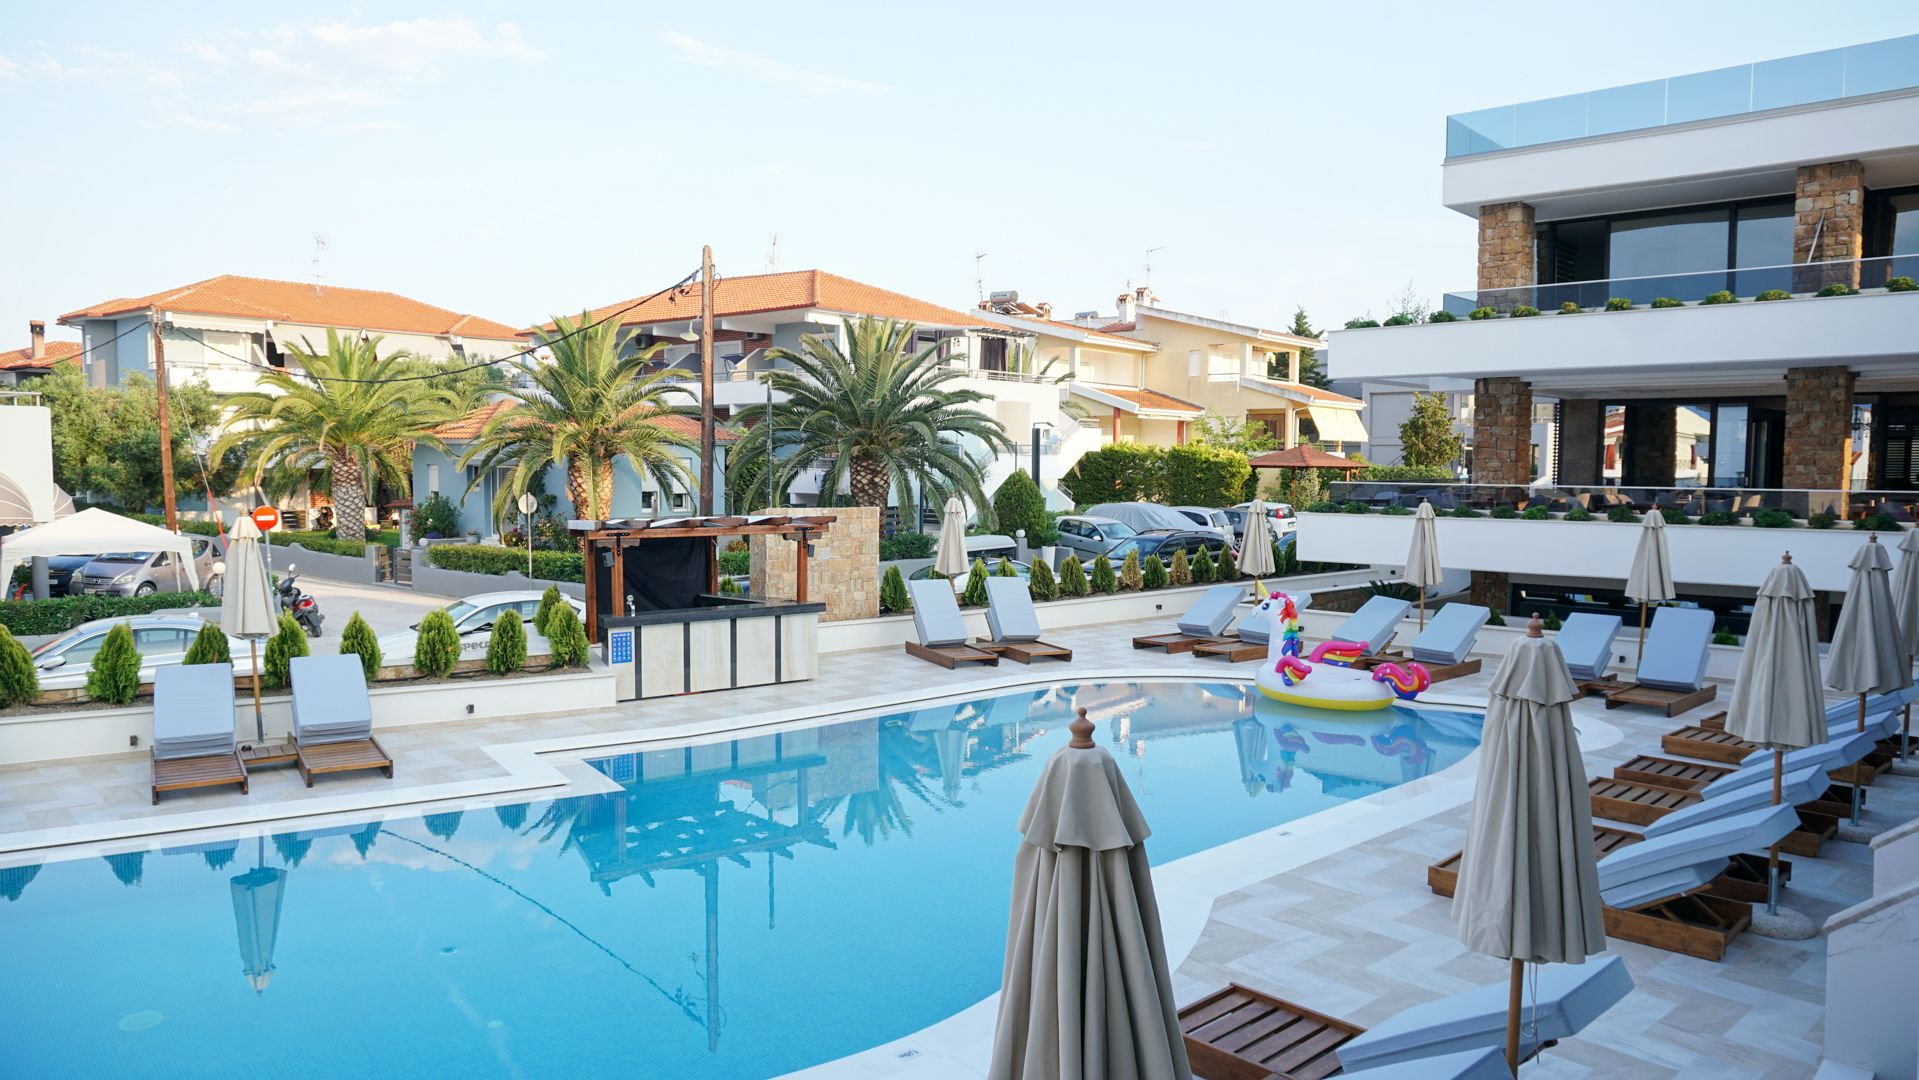 Agnes Deluxe Hotel - Κασσάνδρα, Χαλκιδική ✦ -10% ✦ 4 Ημέρες (3 Διανυκτερεύσεις) ✦ 2 άτομα ✦ Πρωινό ✦ 27/08/2020 έως 13/09/2020 ✦ Κοντά στην παραλία!